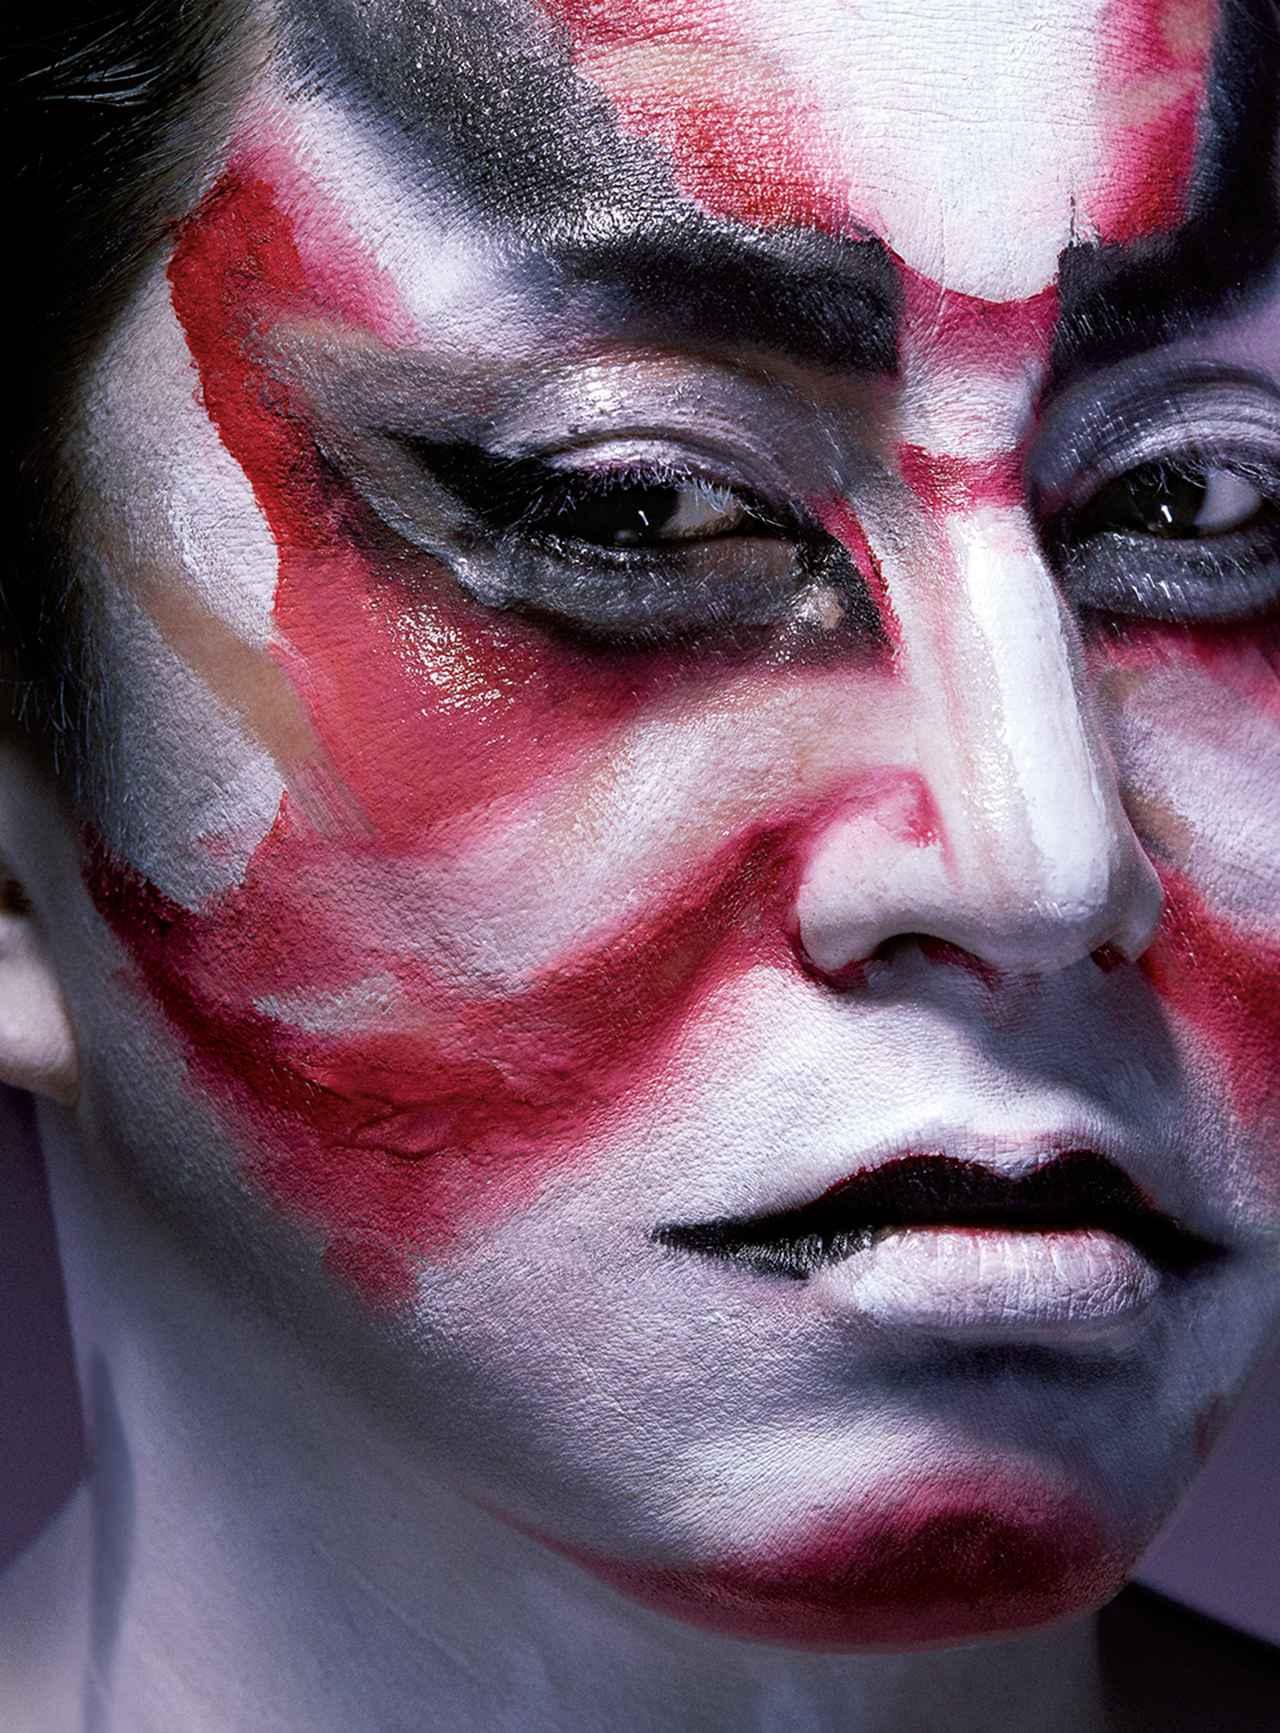 Images : 2番目の画像 - 「松本幸四郎の 歌舞伎メイク進化論」のアルバム - T JAPAN:The New York Times Style Magazine 公式サイト